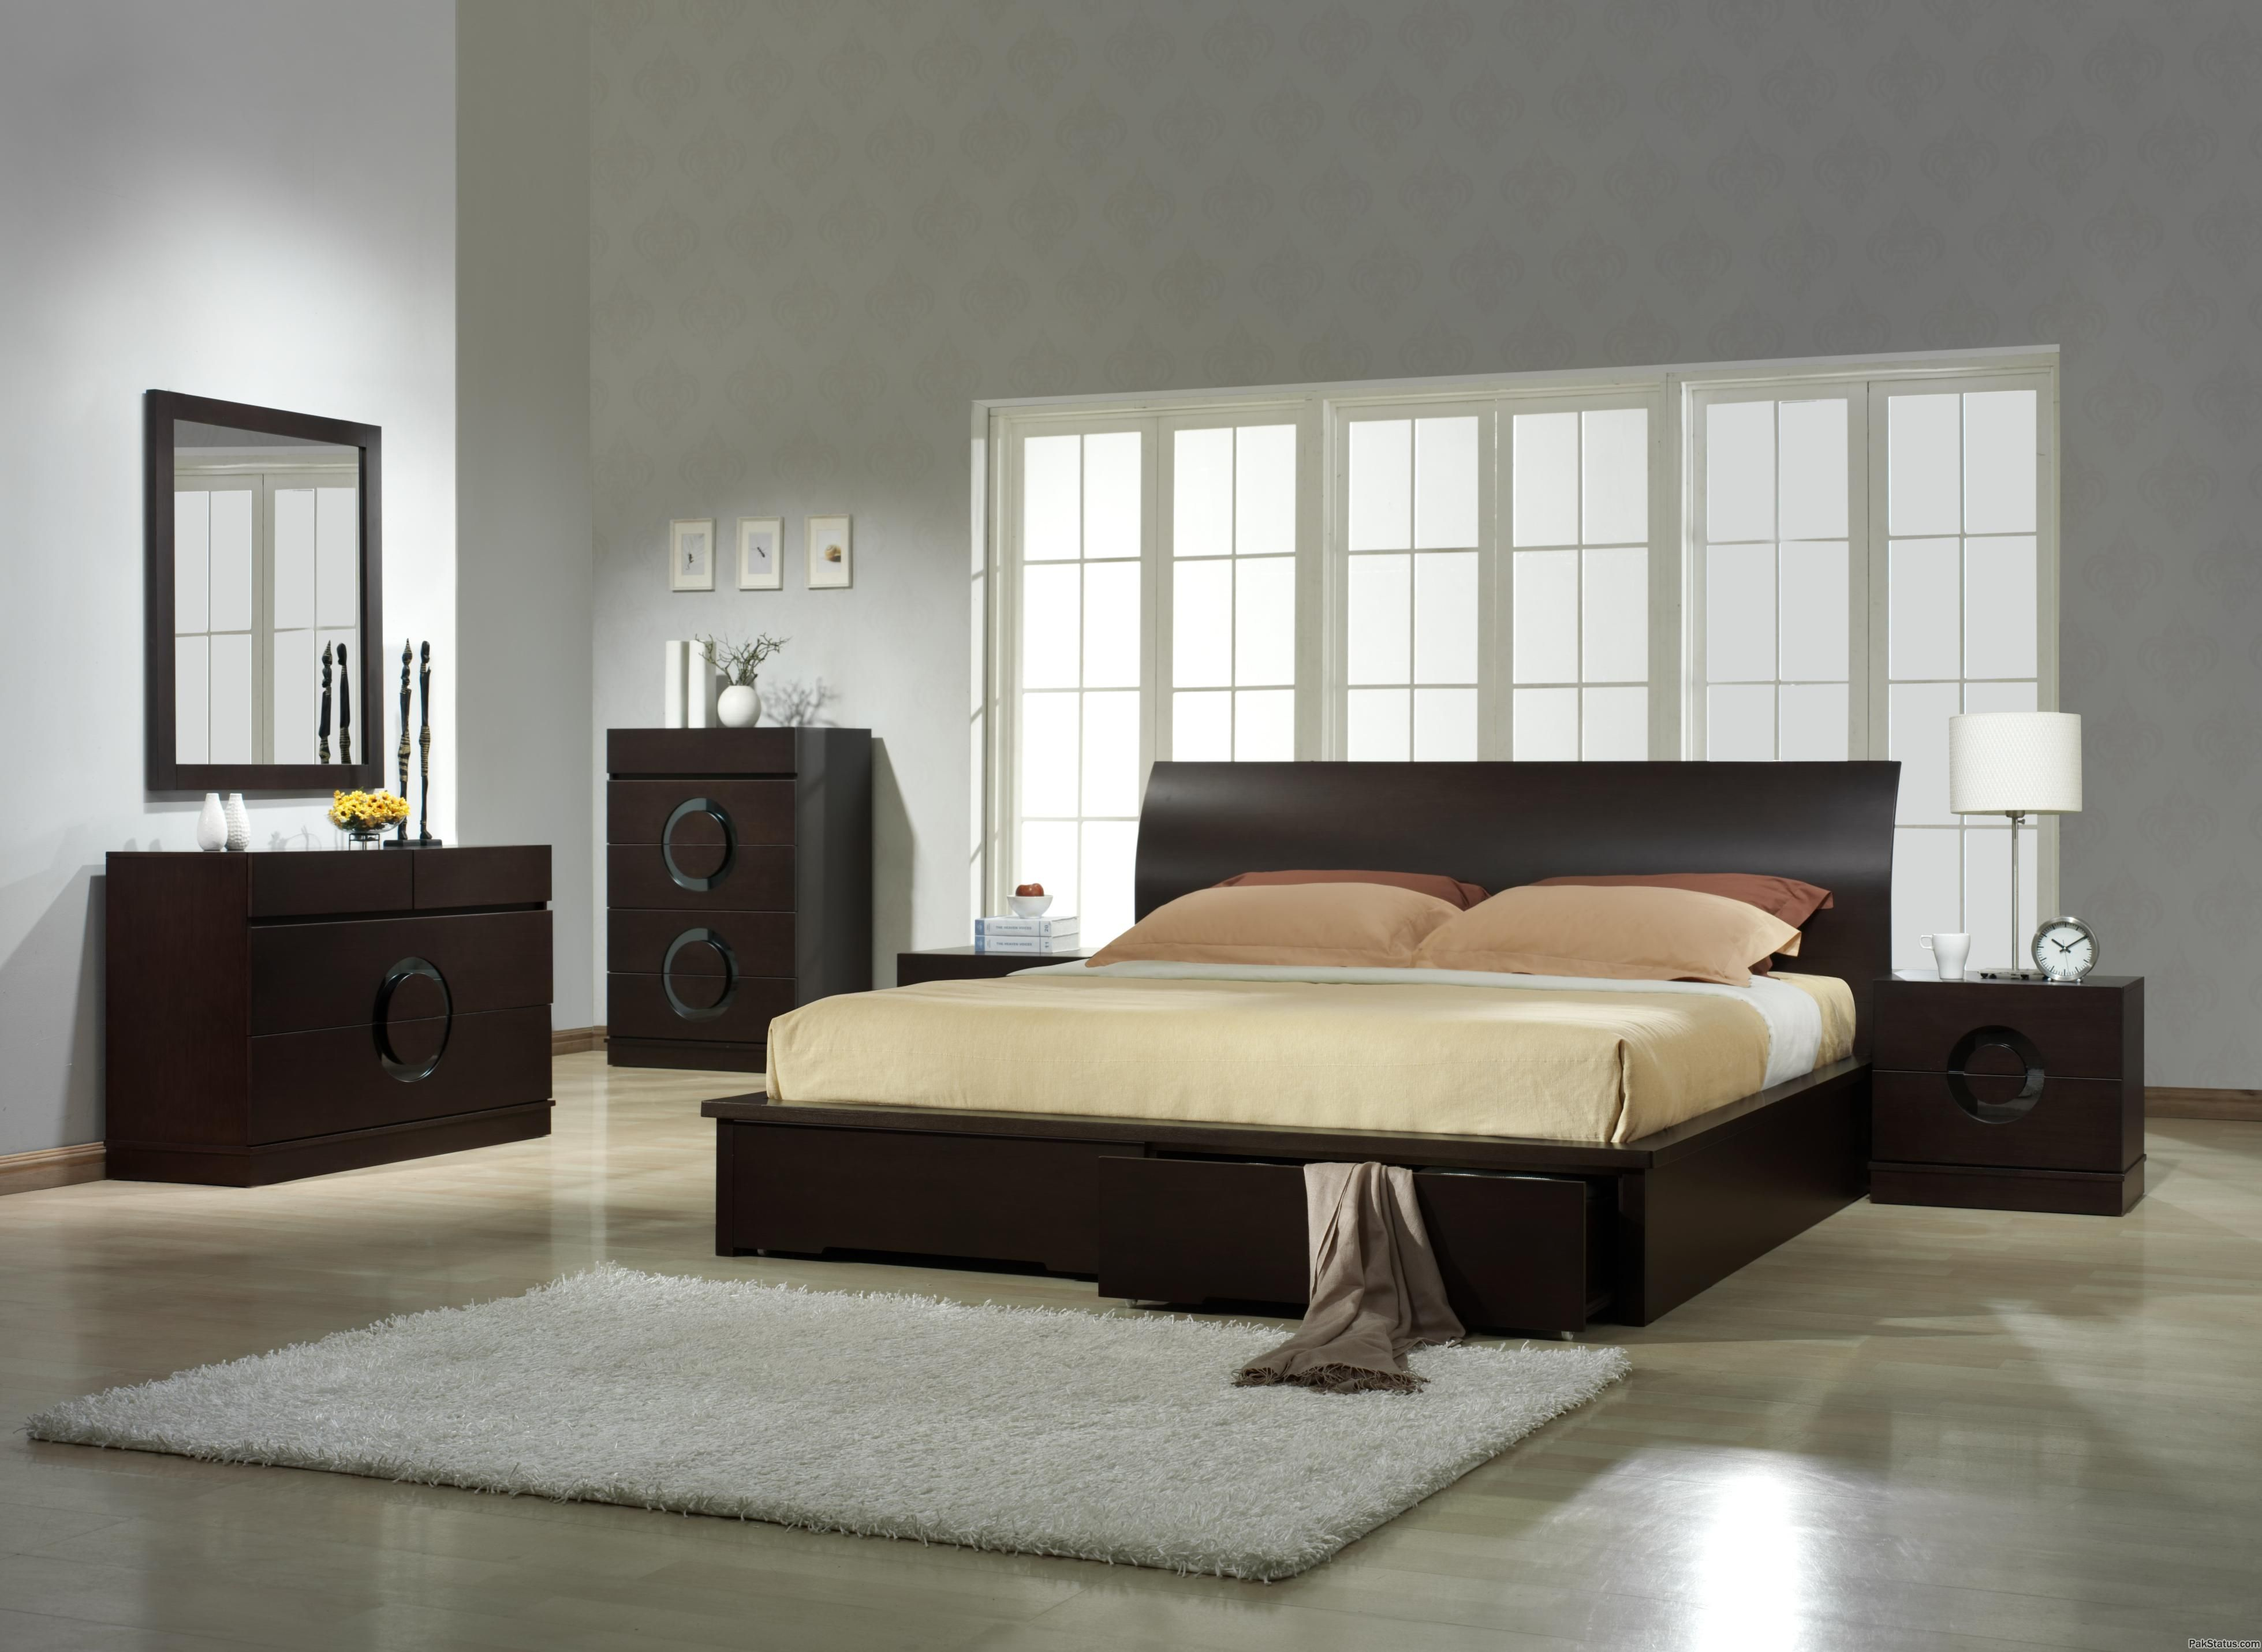 Best Kitchen Gallery: Latest Double Bed Designs One Bedroom Apartments In Dayton Ohio of New Bedroom Set Designs  on rachelxblog.com